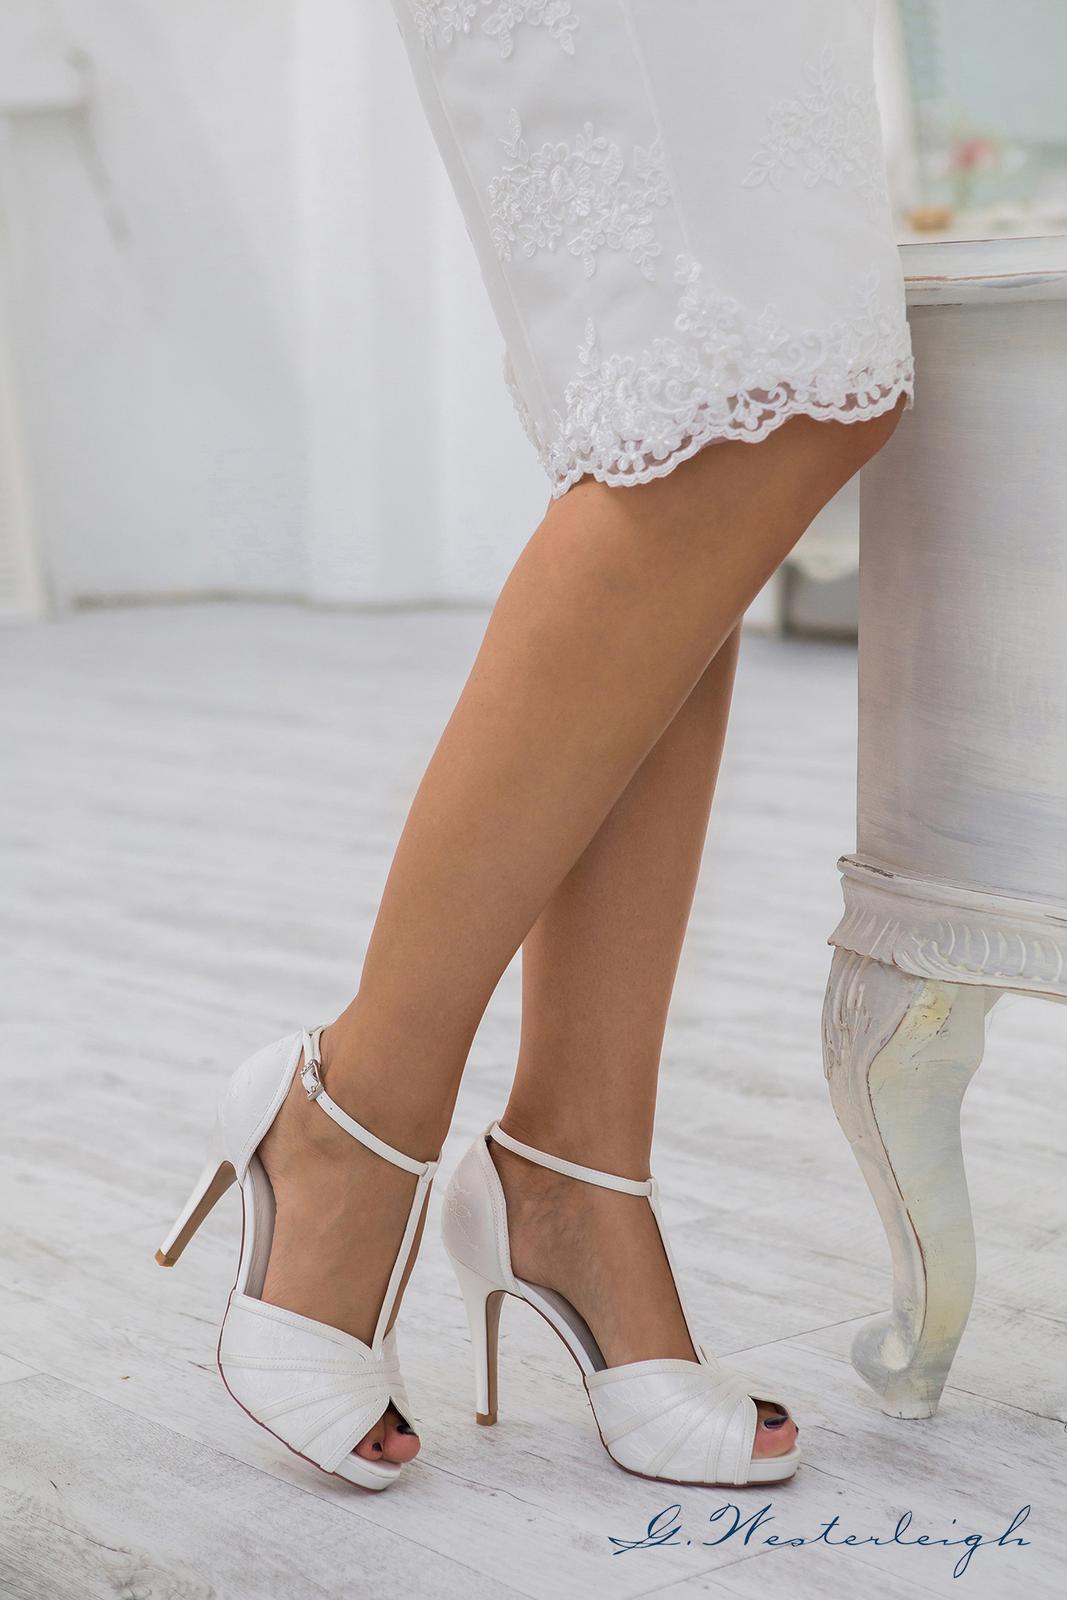 Svadobné topánky Scarlett - Obrázok č. 4